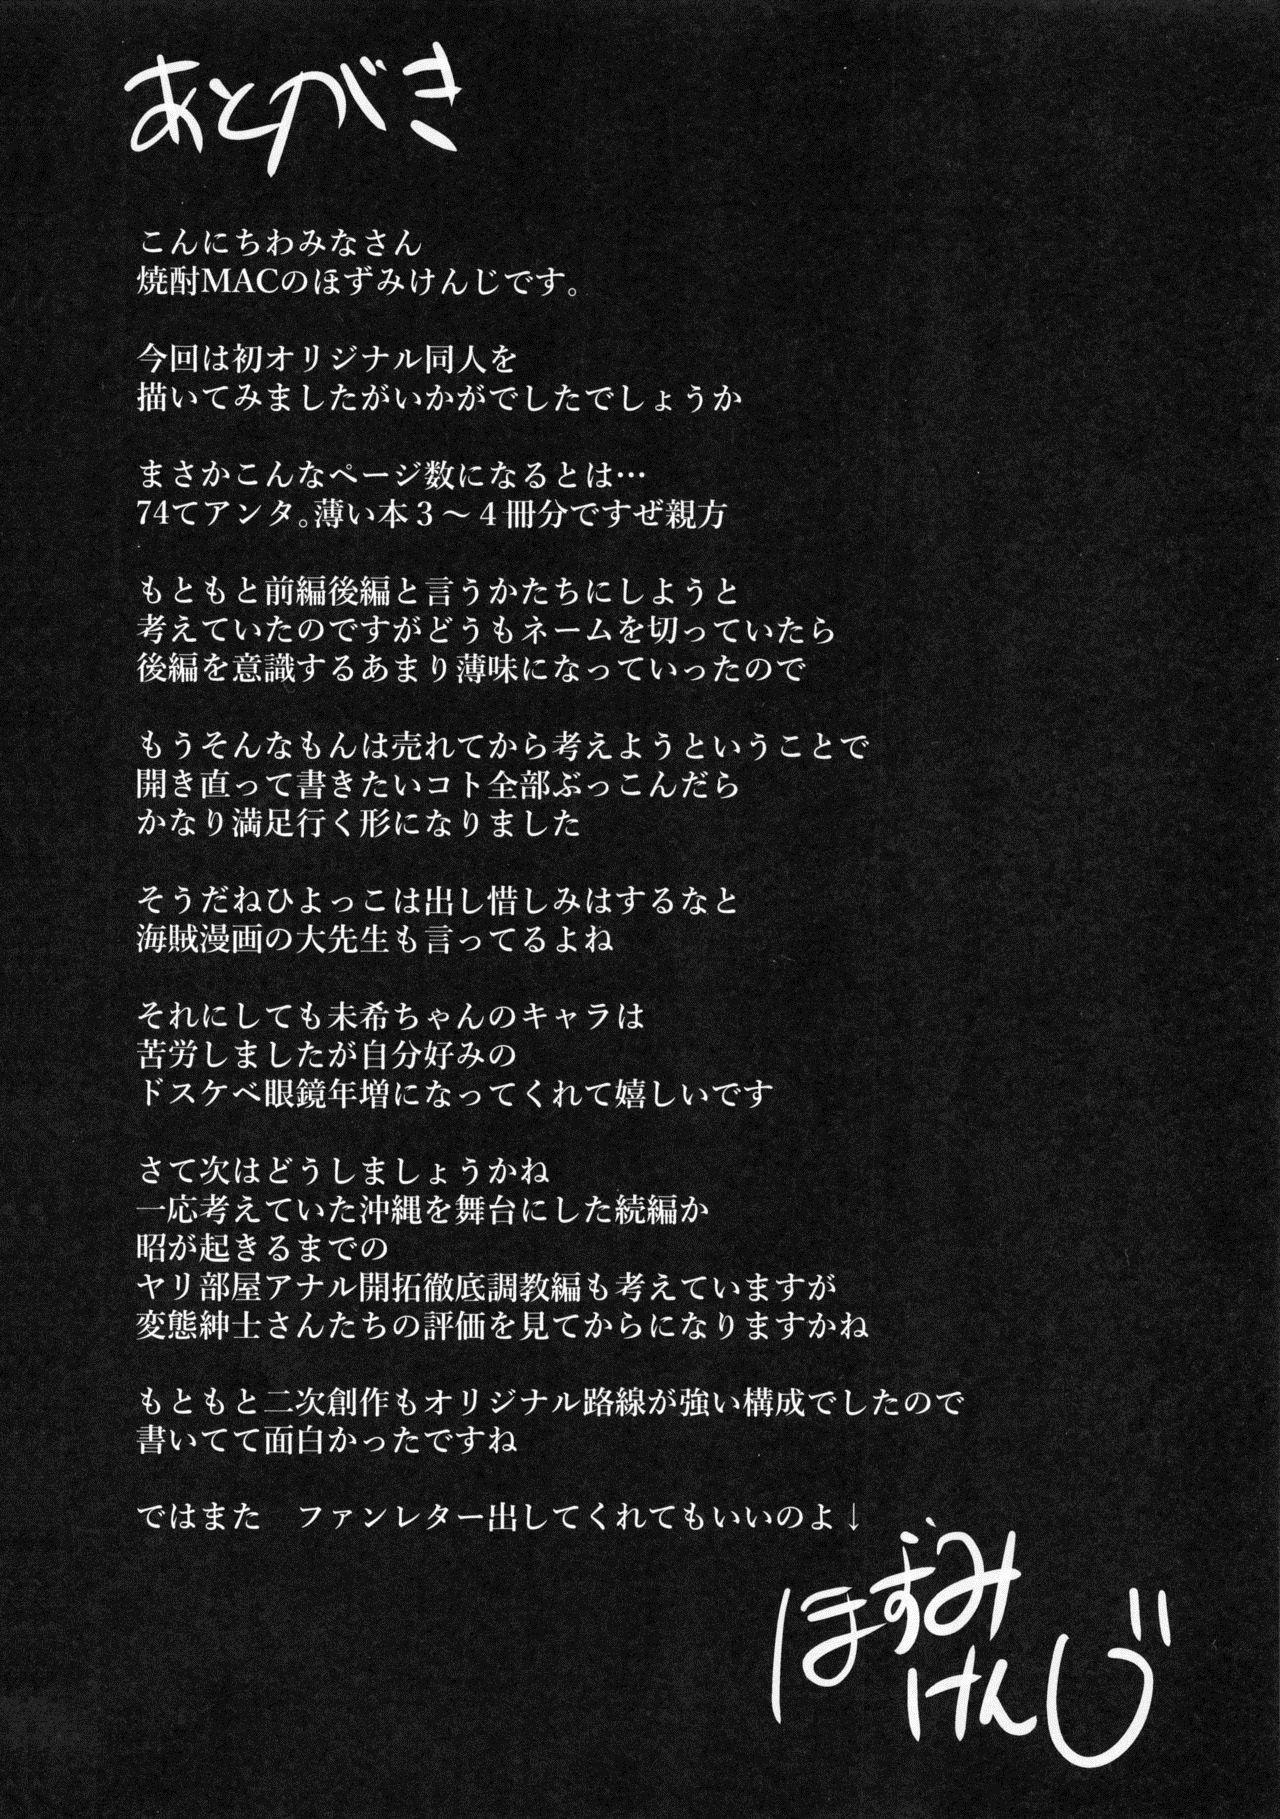 NTR Shinkon Ryokou | NTR Honeymoon 74